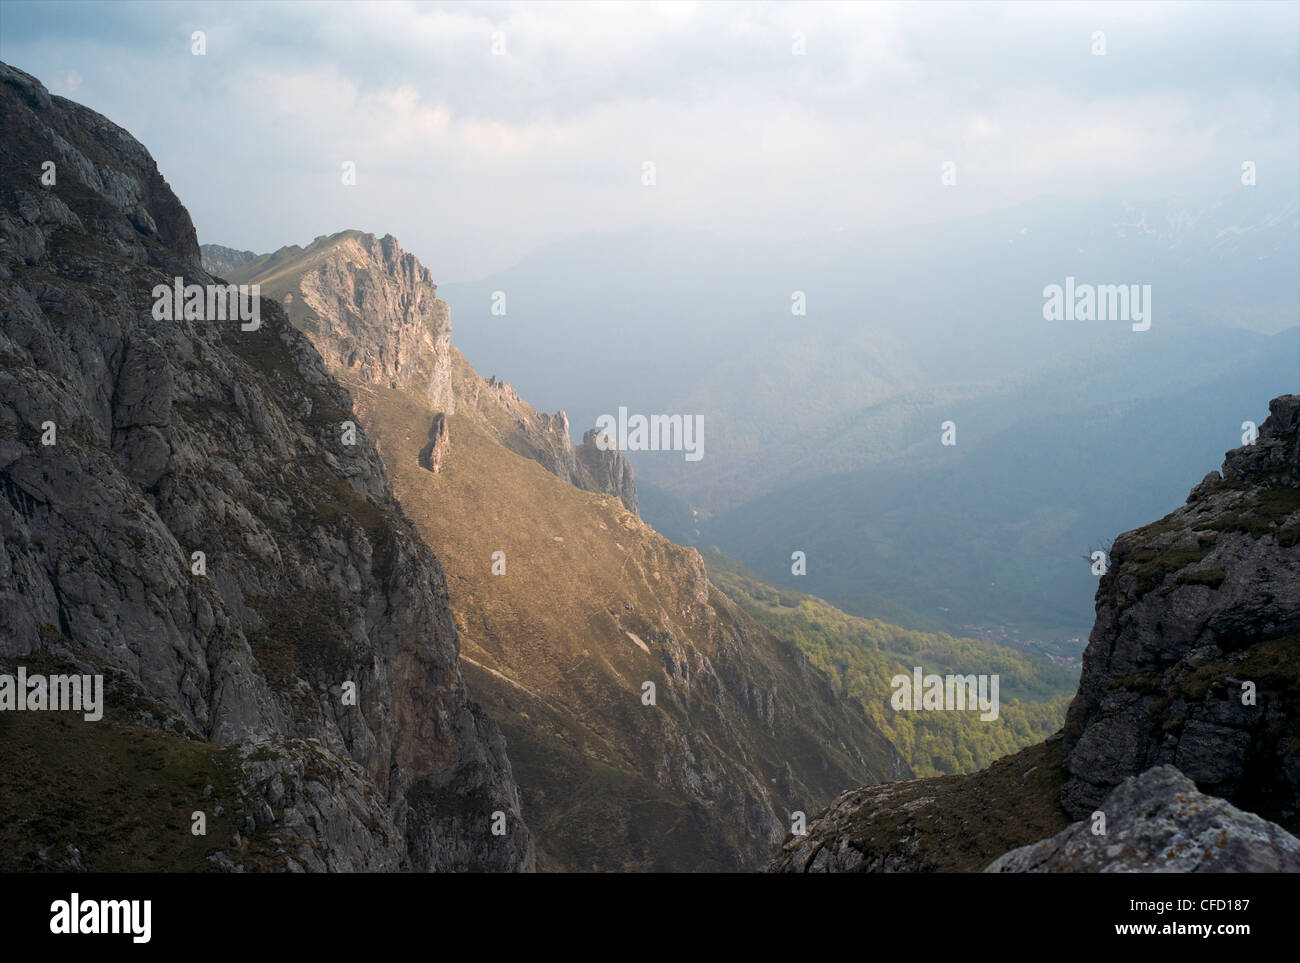 Fuente De, Picos de Europa, Cantabria, Spain, Europe - Stock Image